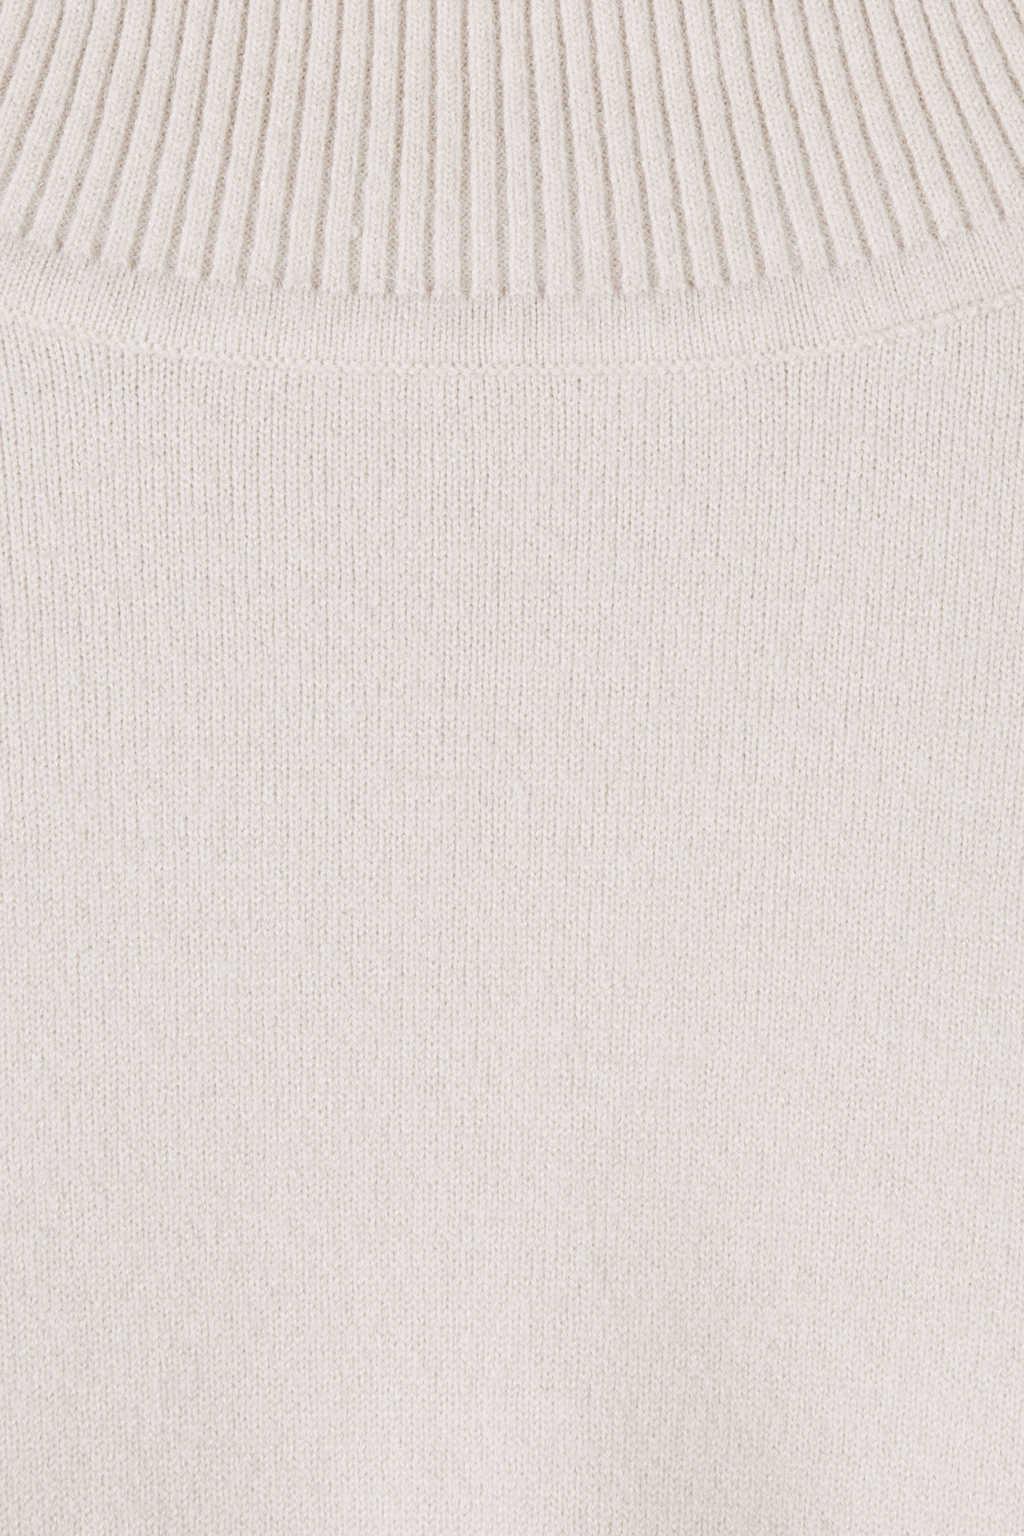 Sweater 2610 Beige 19